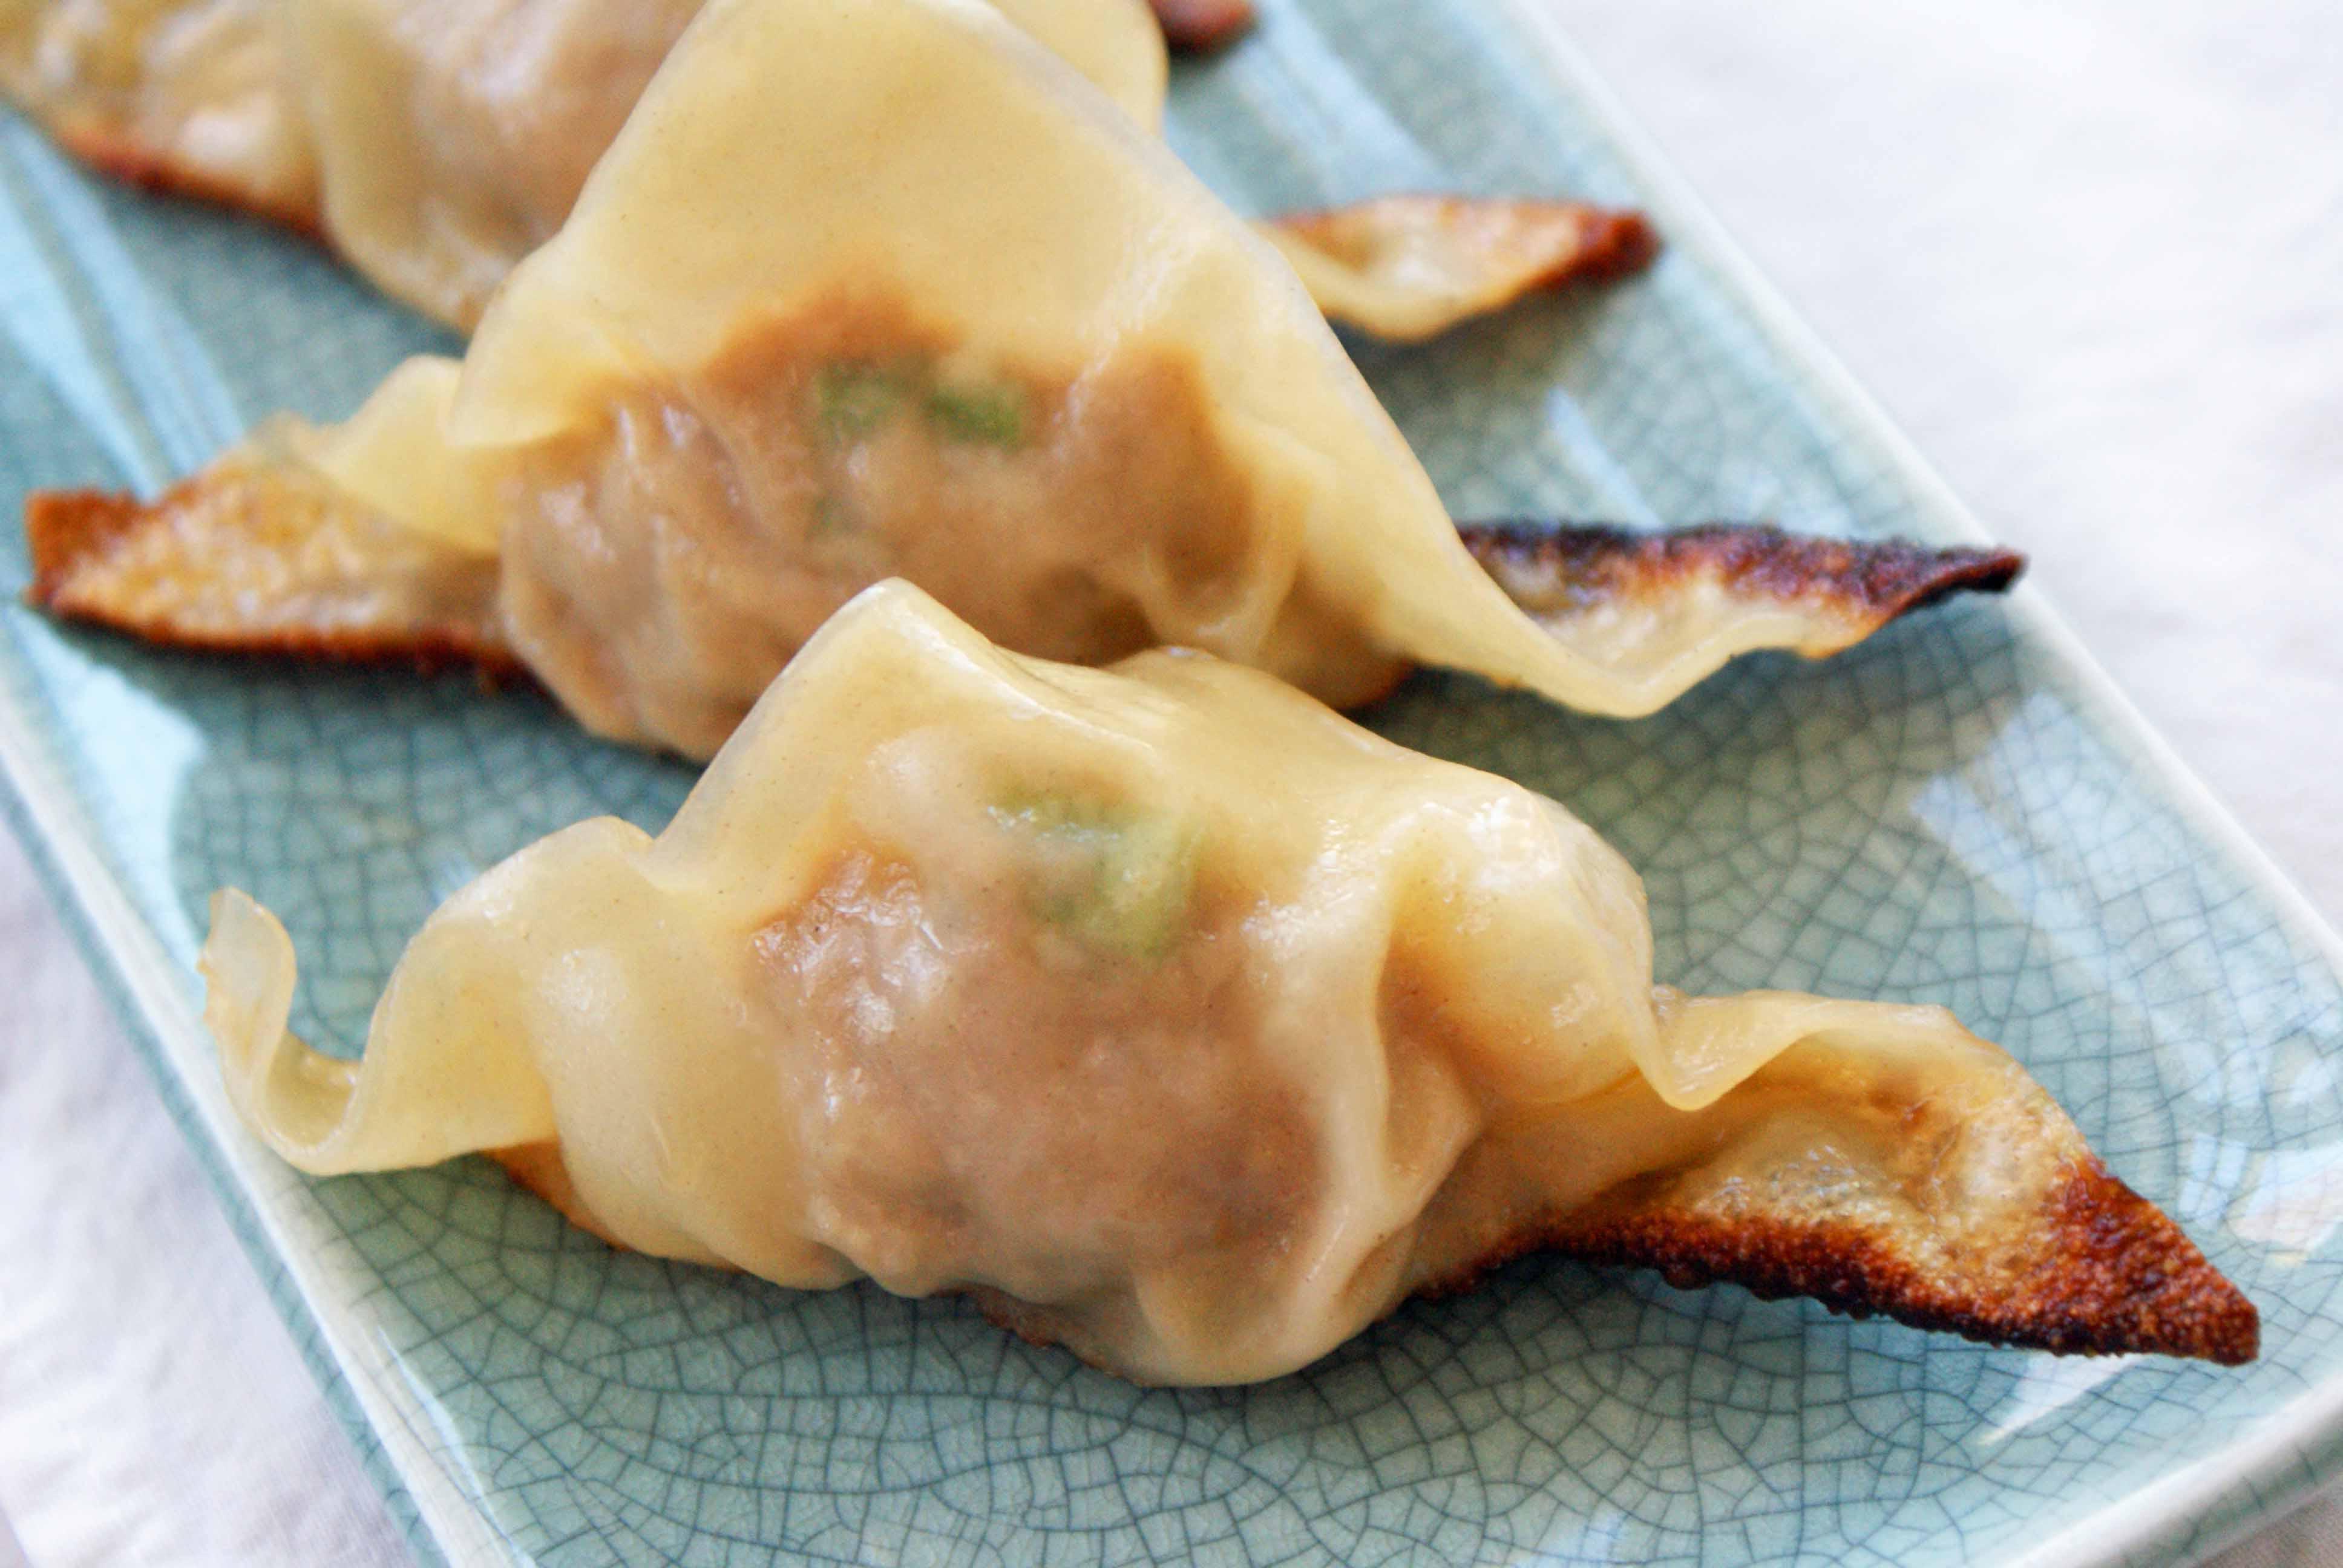 and pork dumplings chicken cabbage and cellophane noodle dumplings ...